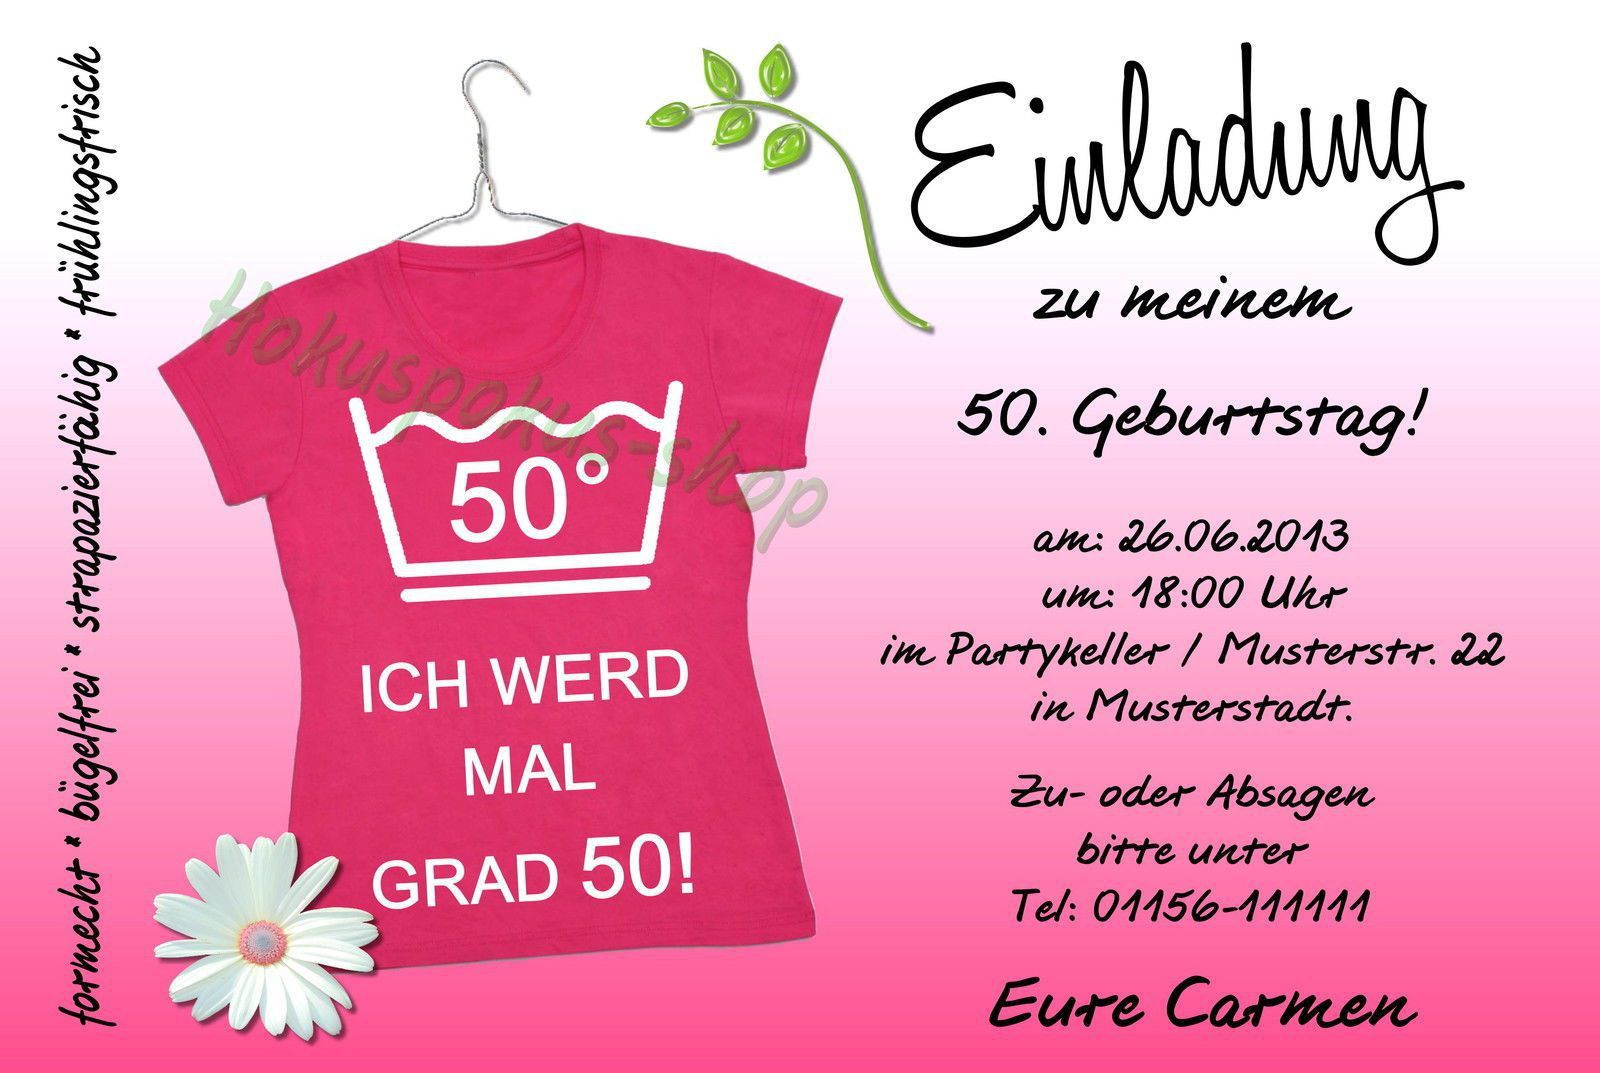 Geburtstagskarten 50 Geburtstag Text Best Of Einladung Geburtstag